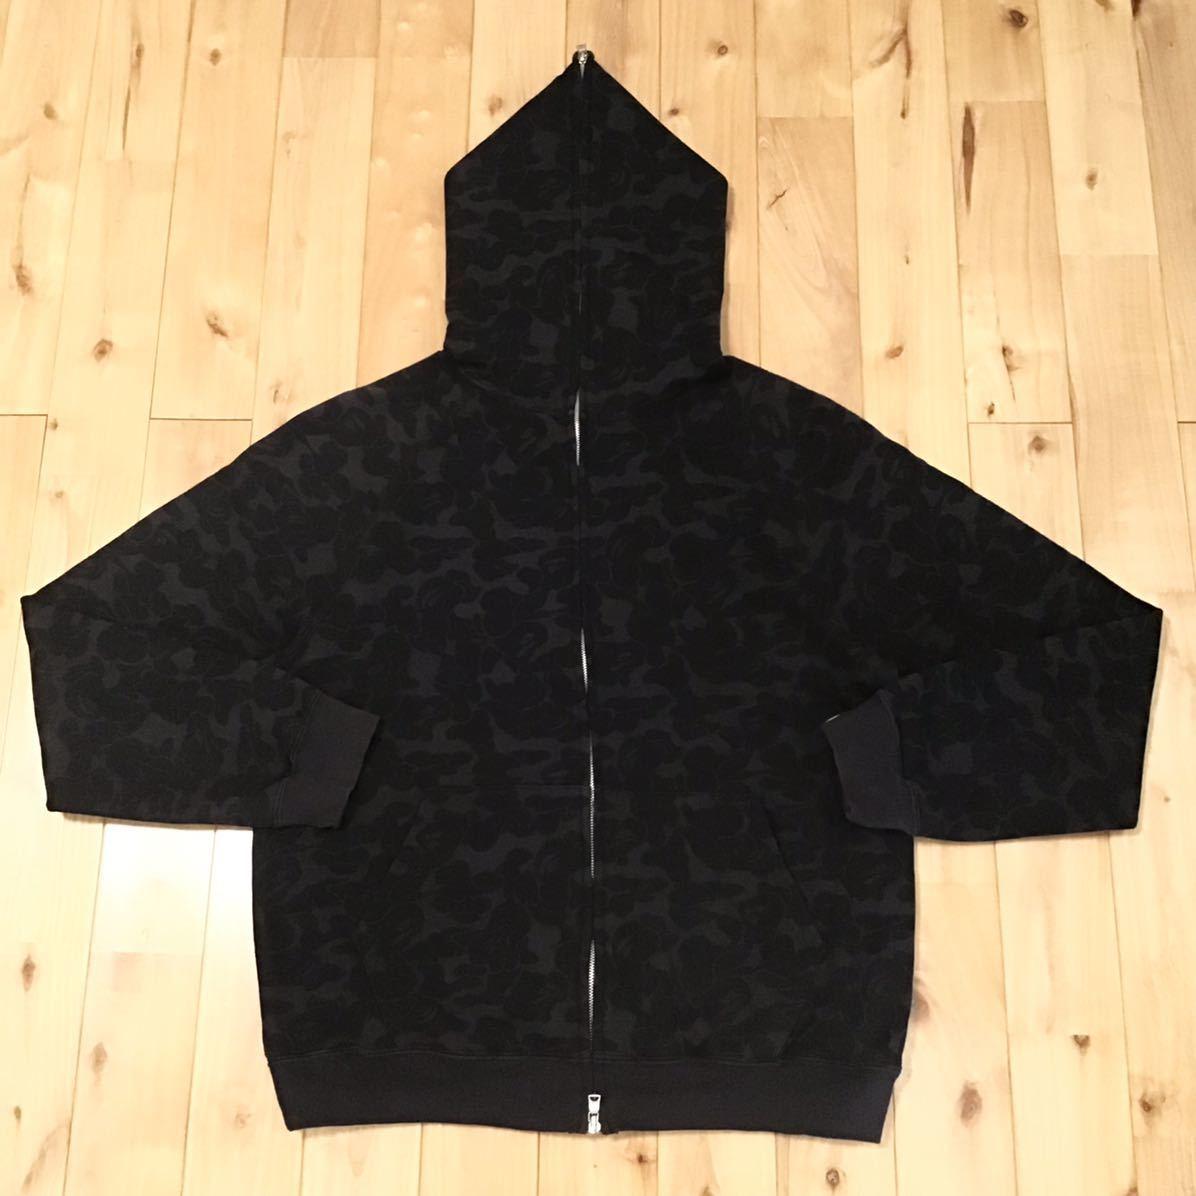 Solid camo フルジップ パーカー Mサイズ a bathing ape BAPE full zip hoodie エイプ ベイプ アベイシングエイプ ソリッドカモ 迷彩 6qq